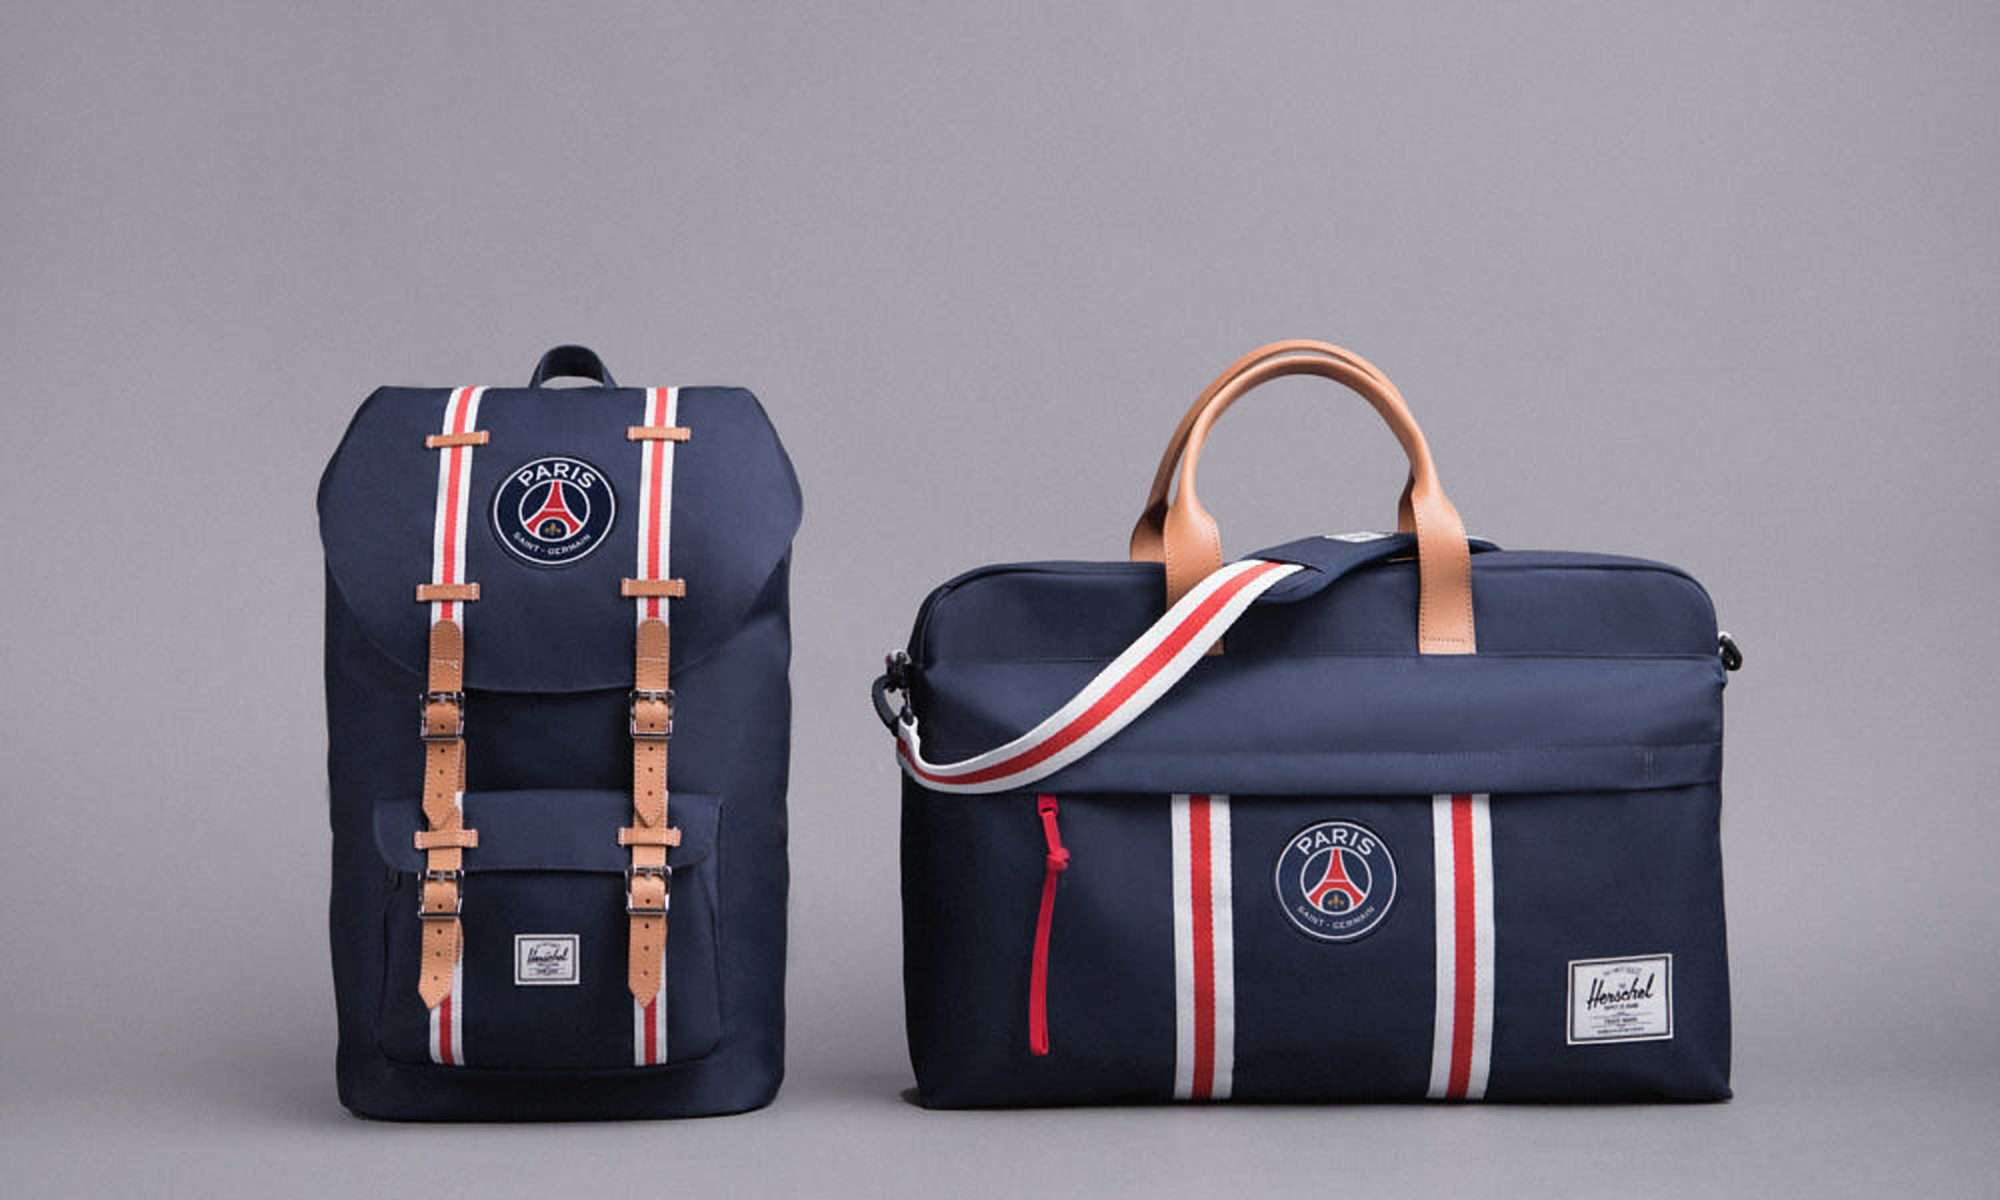 Louis Vuitton Trunk Set